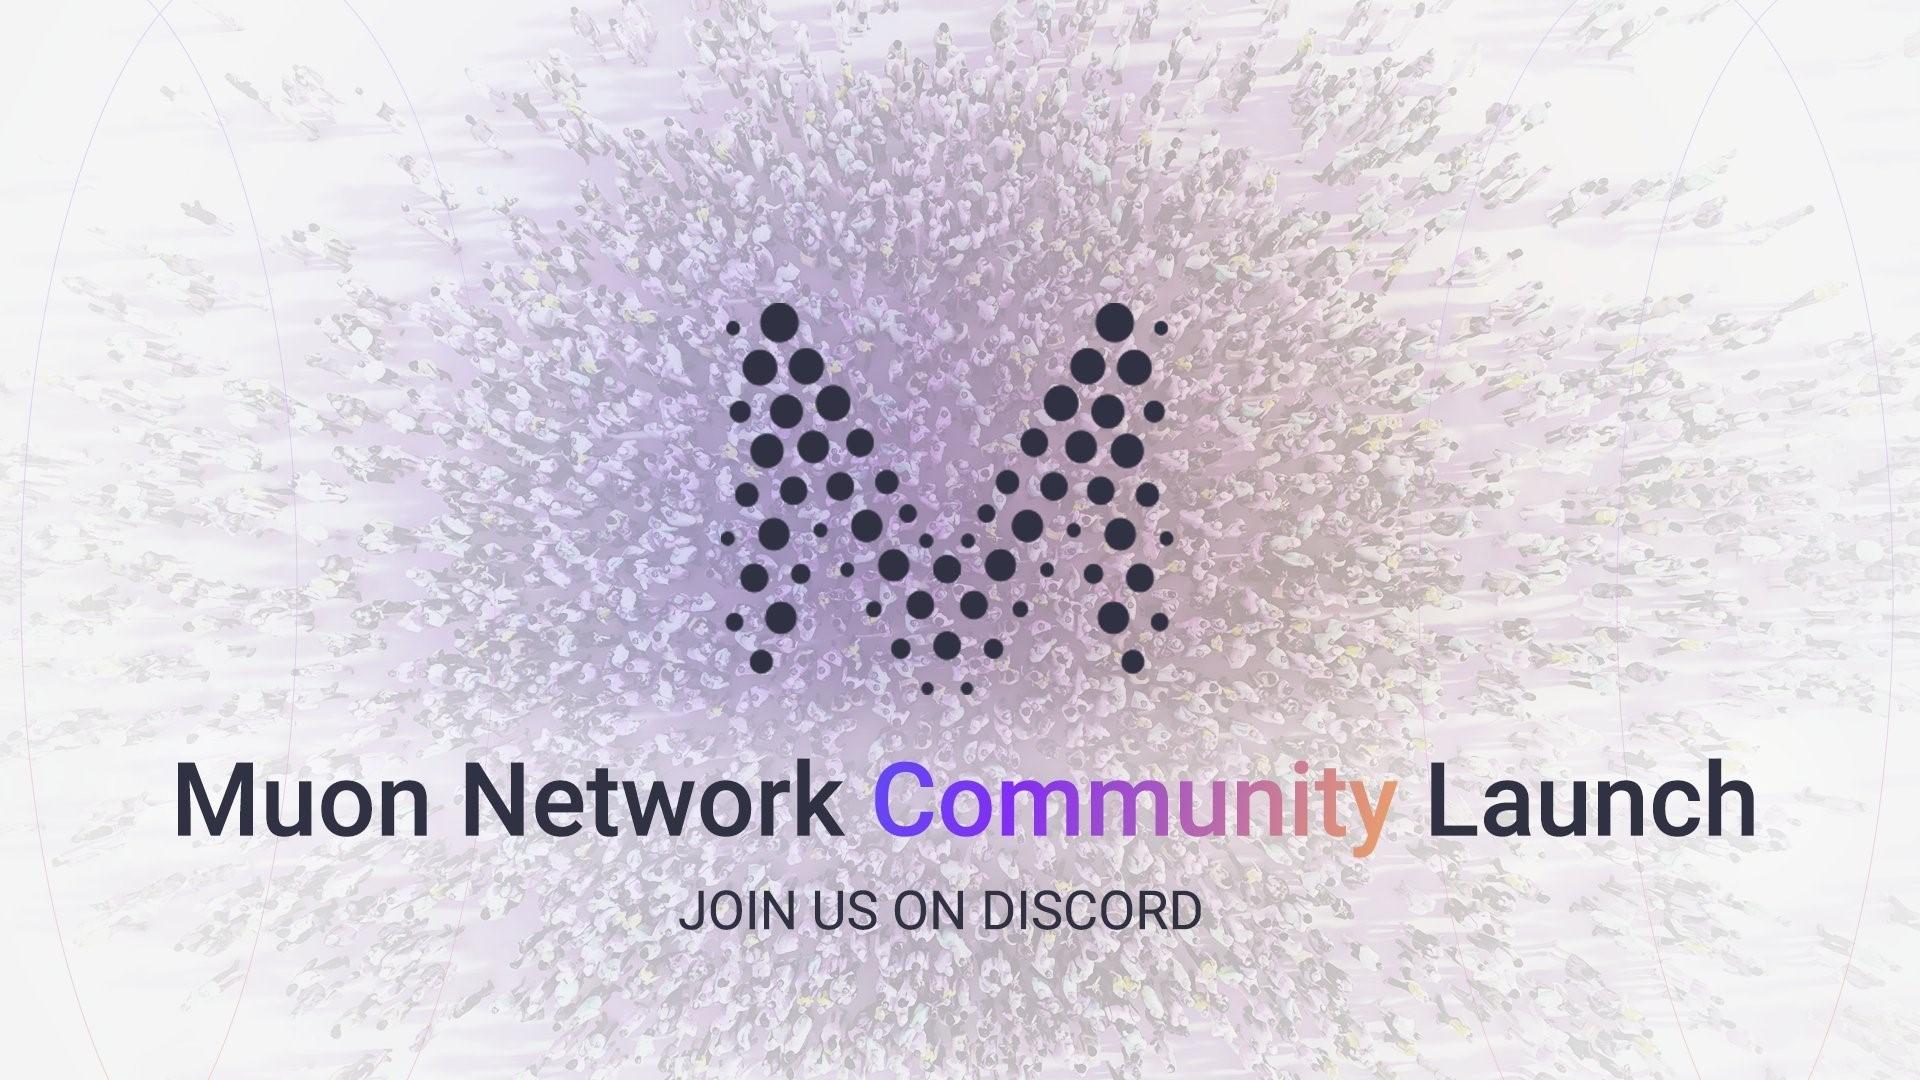 Muon Community Launch